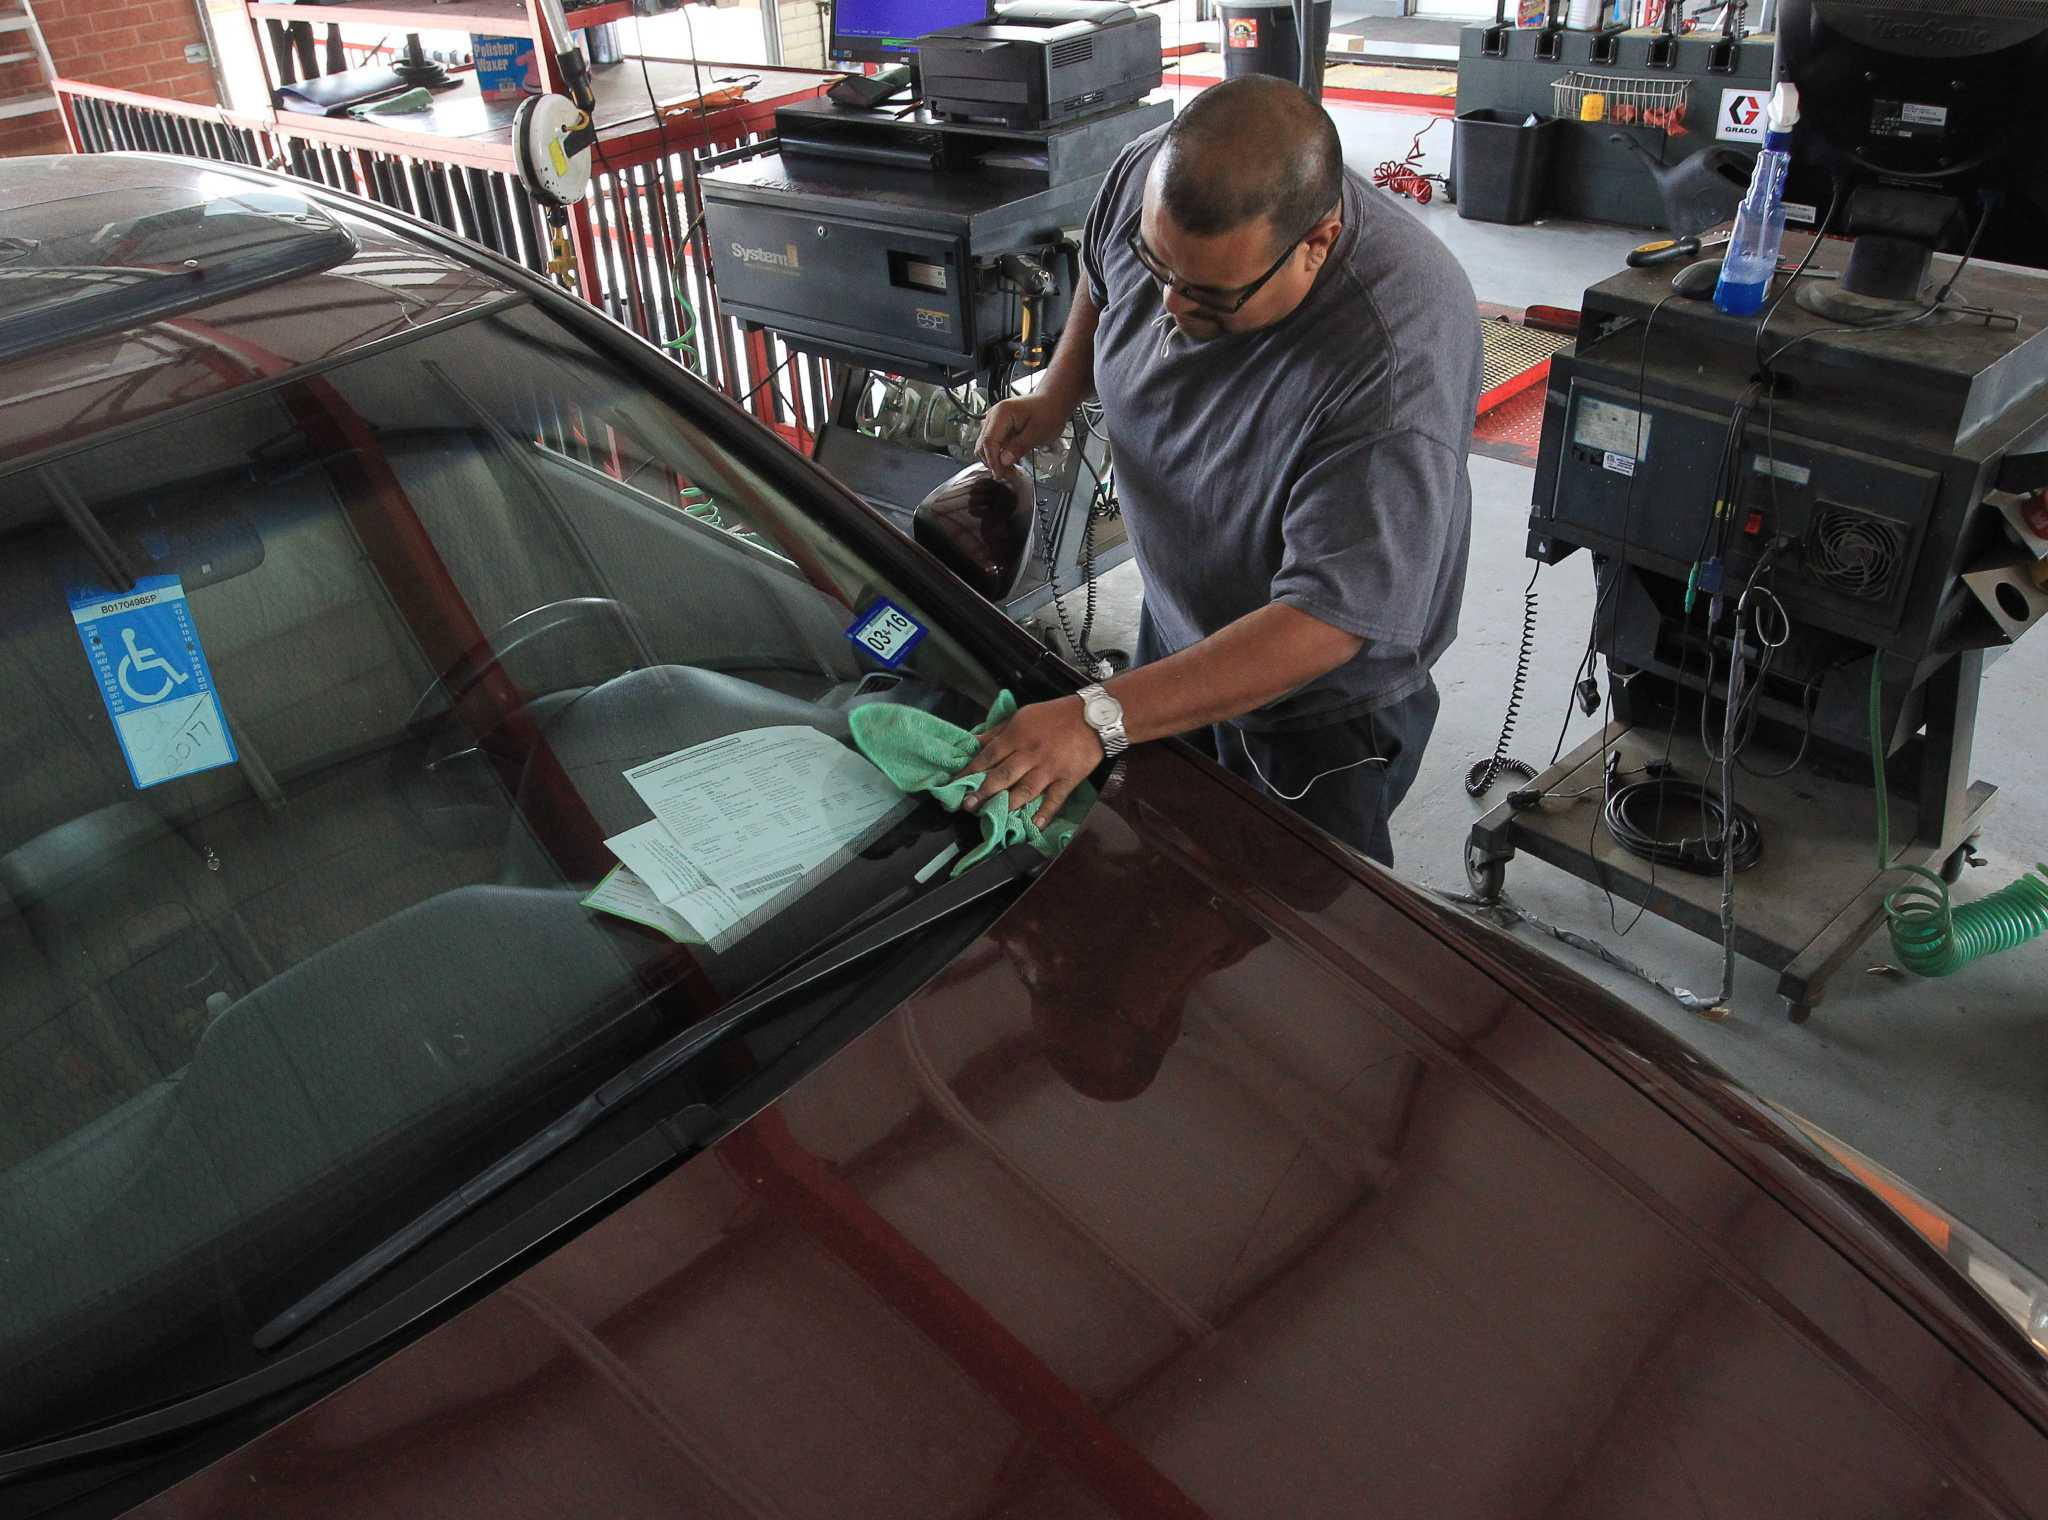 Texas DMV Increases Vehicle Registration Renewal Fees